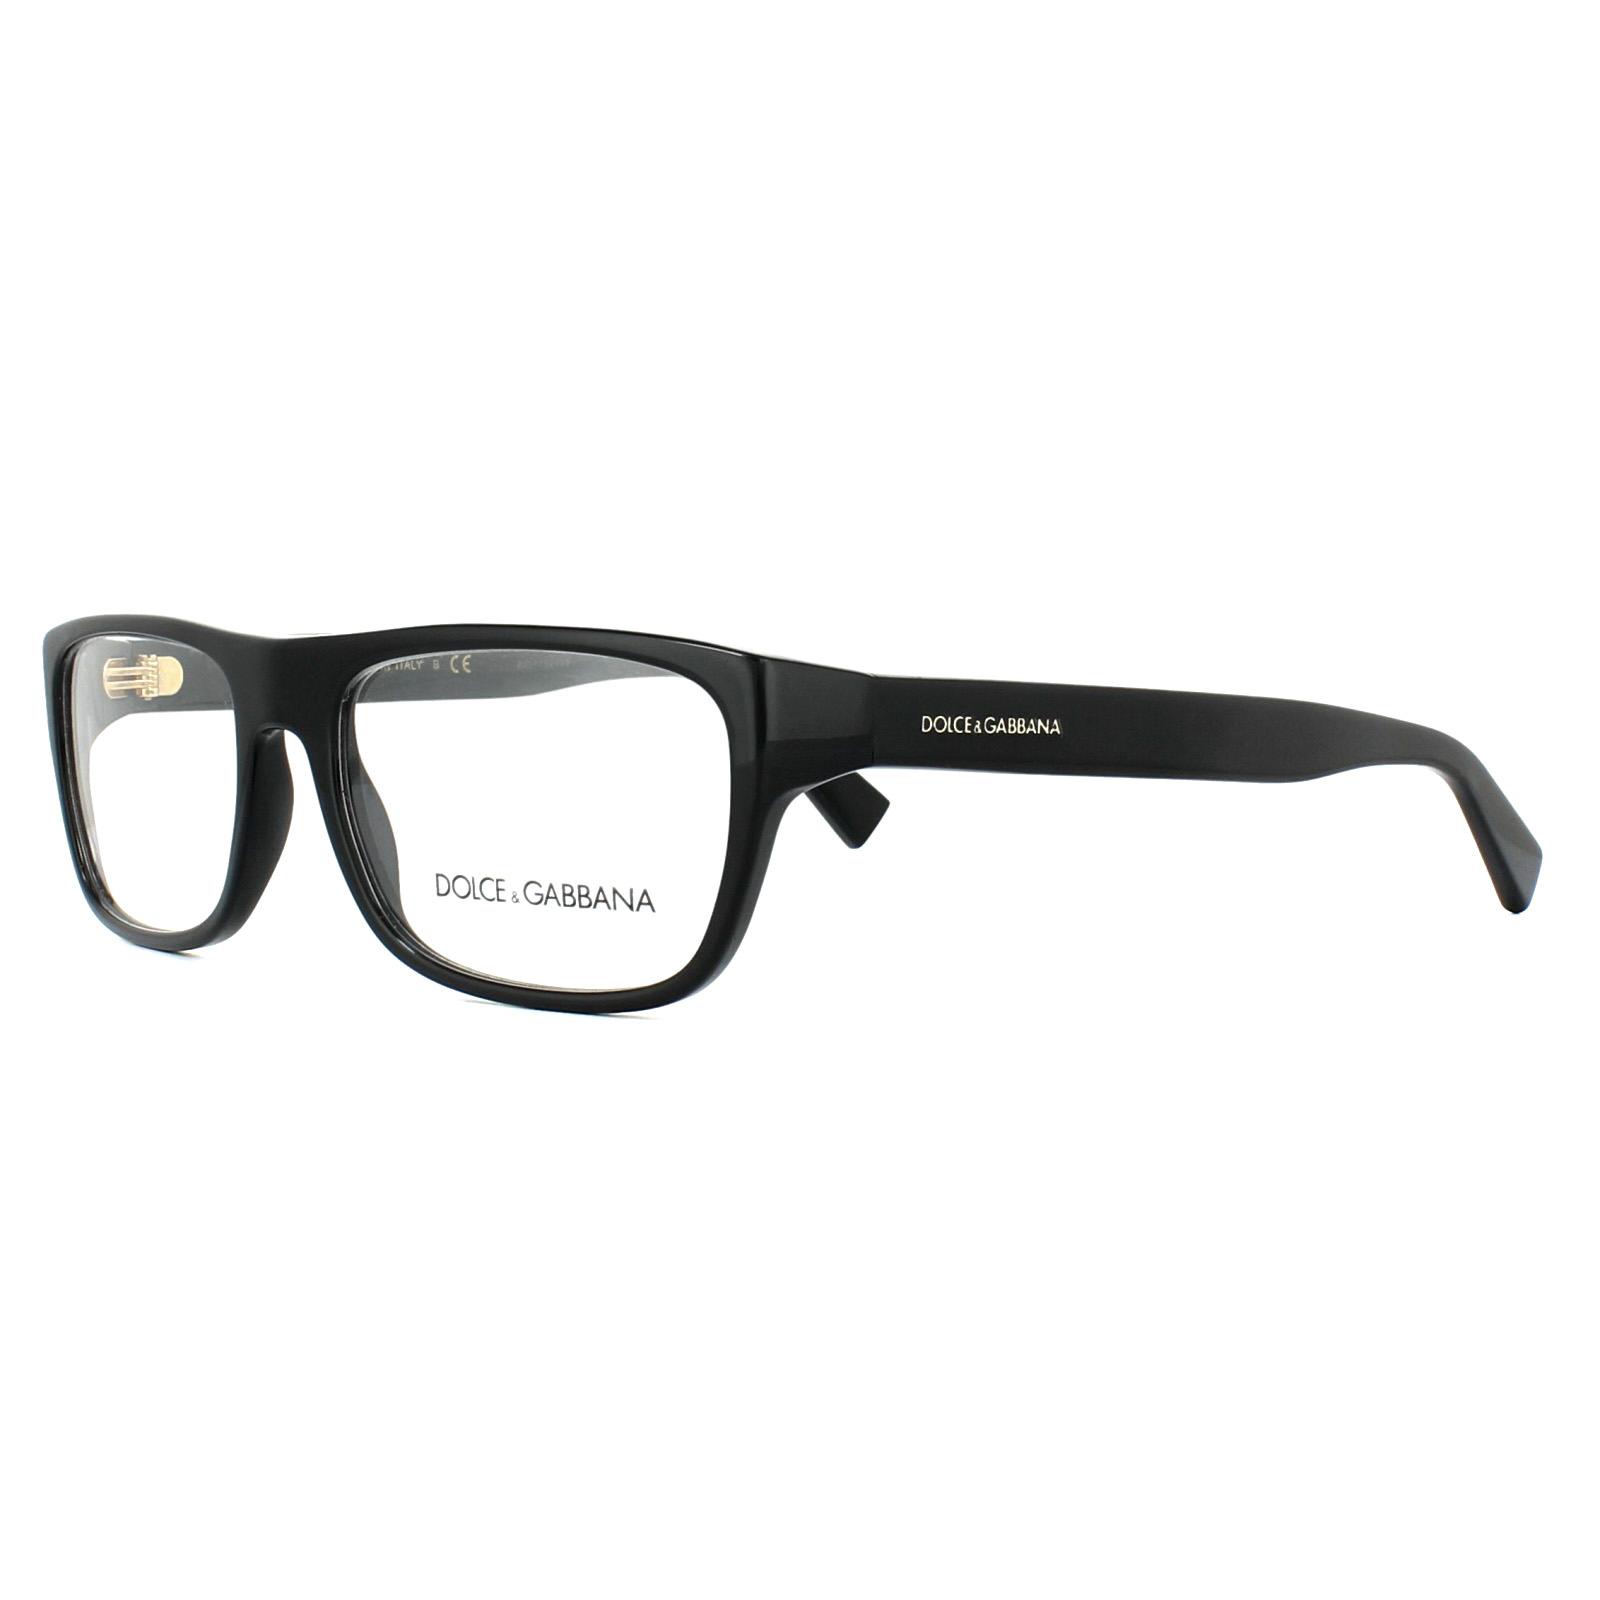 60117c4b58 Sentinel Dolce   Gabbana Glasses Frames DG 3276 501 Black and Olive  Tortoise 54mm Mens